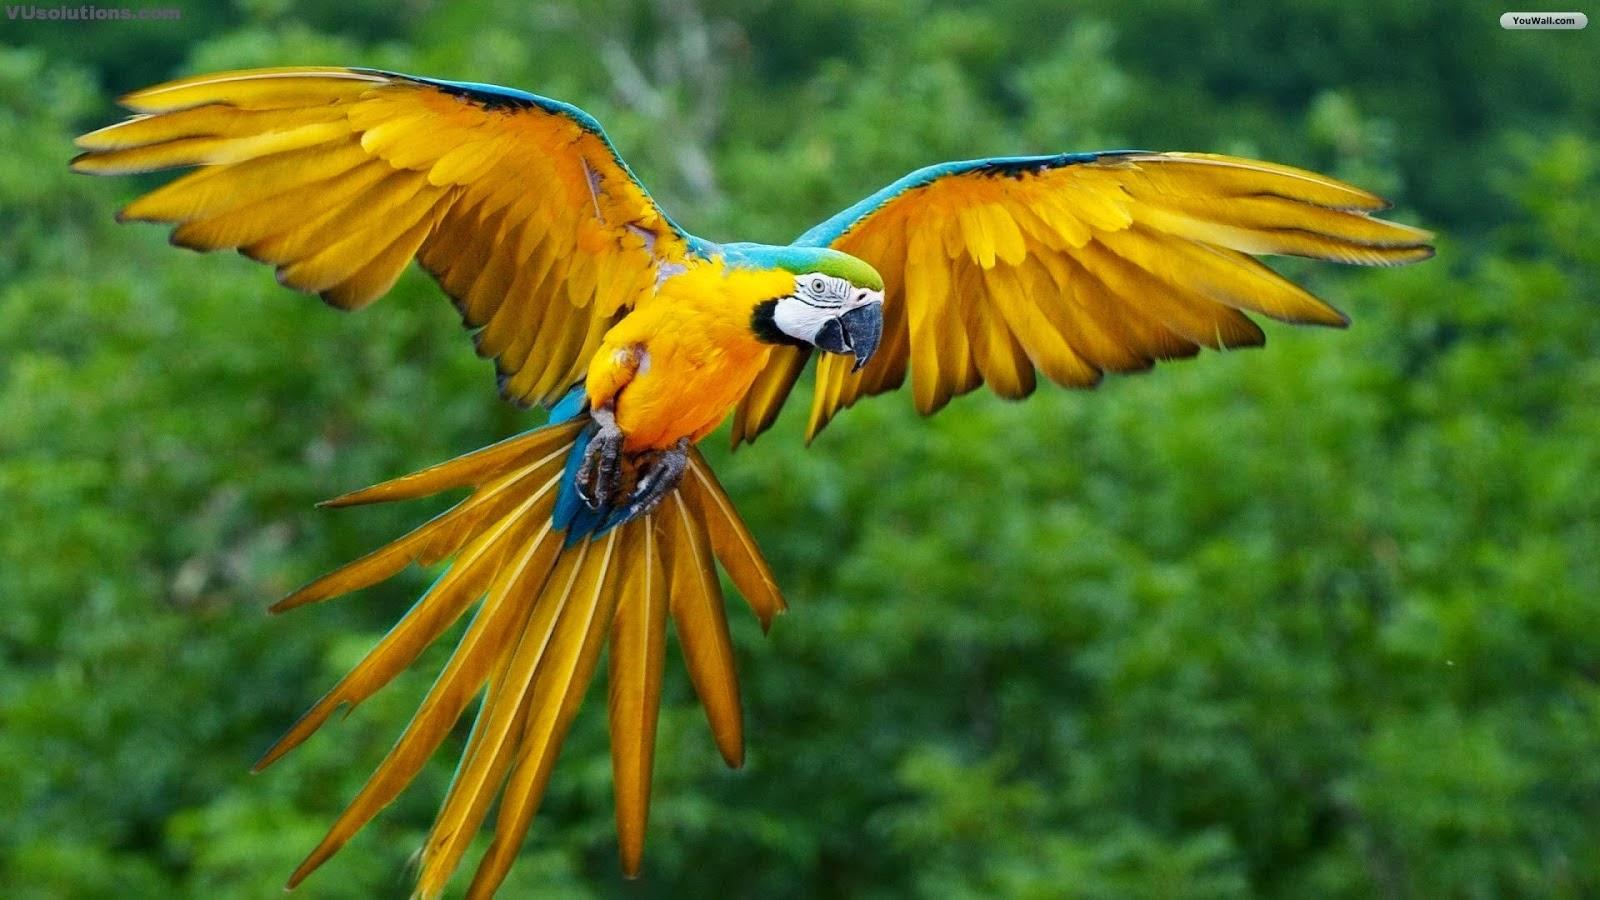 parrot hd wallpaper download 1080p parrot hd wallpaper download 1080p 1600x900